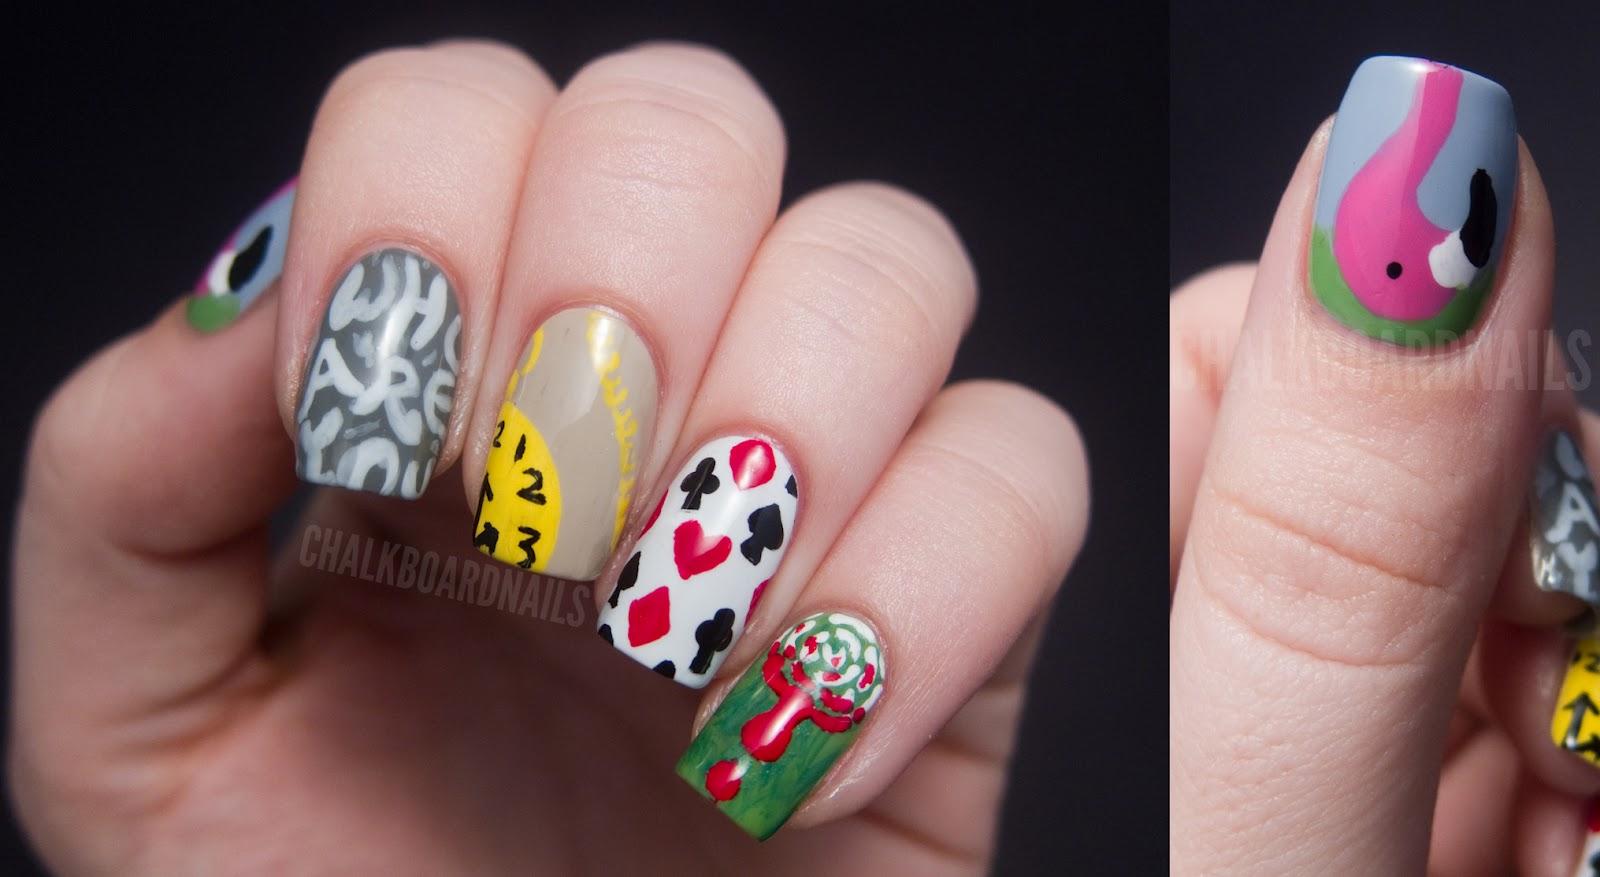 Alice in Wonderland Nail Art | Chalkboard Nails | Nail Art ...